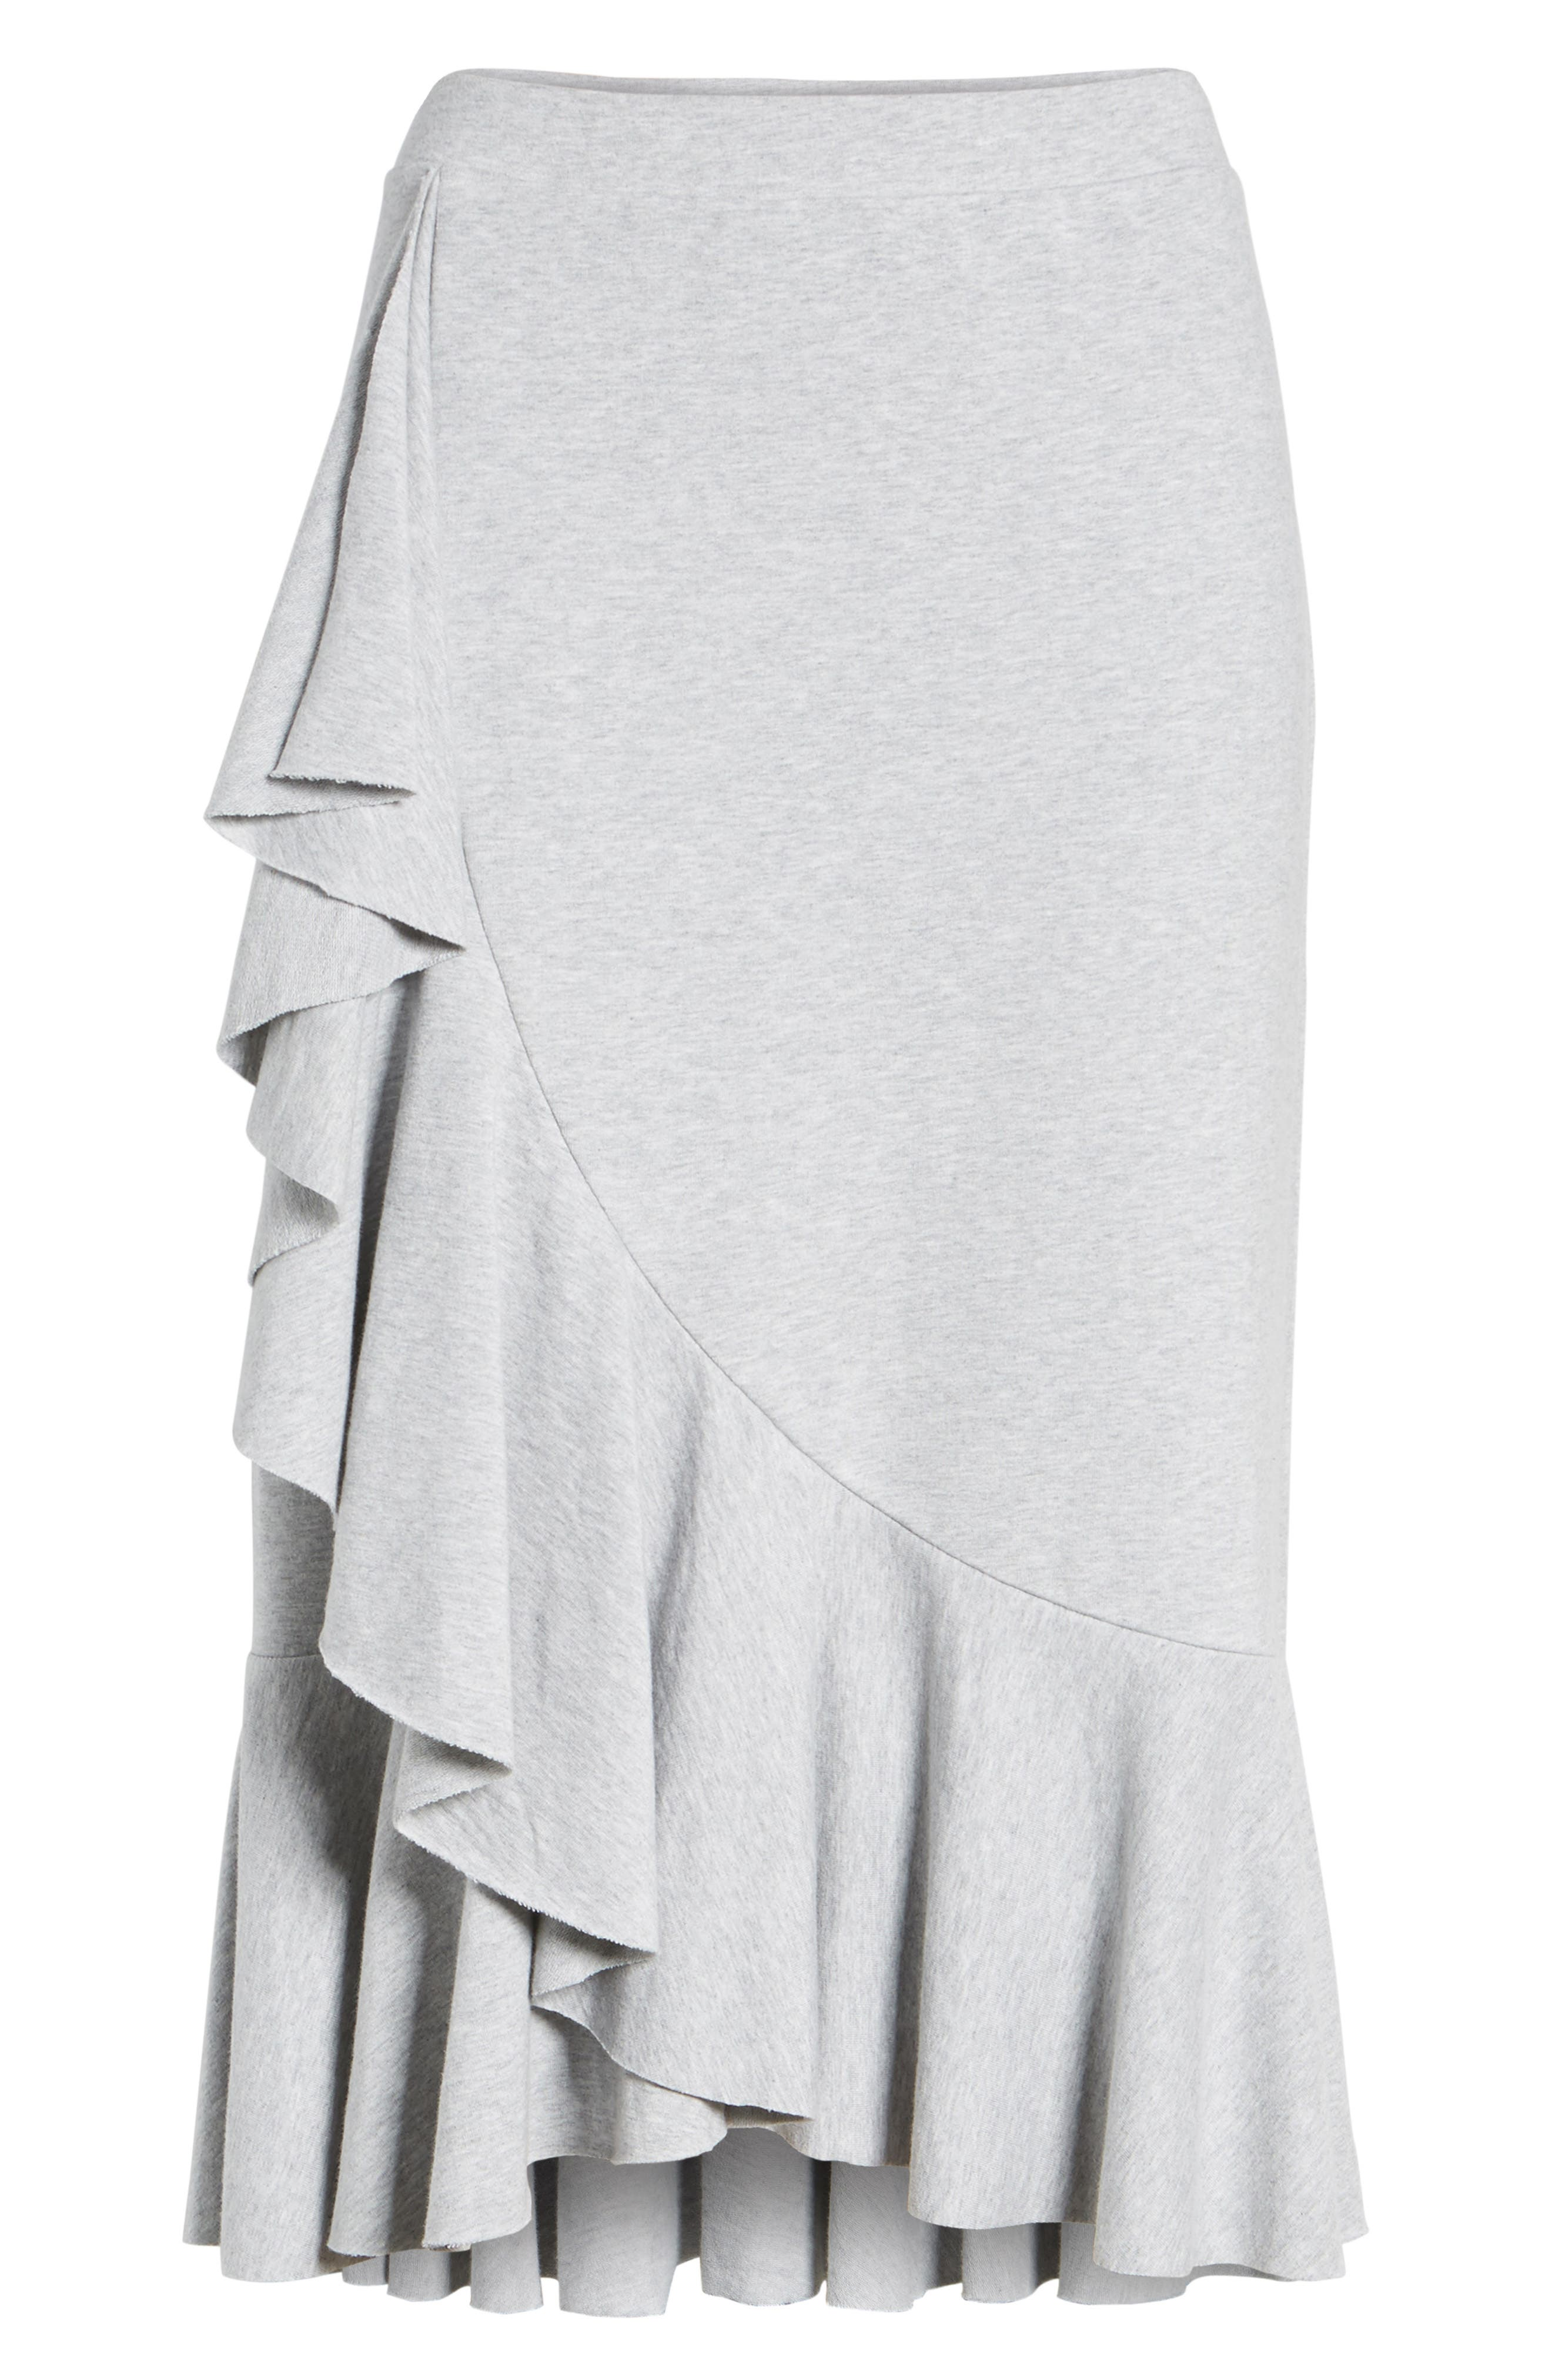 Ruffled Knit Skirt,                         Main,                         color, Heather Grey